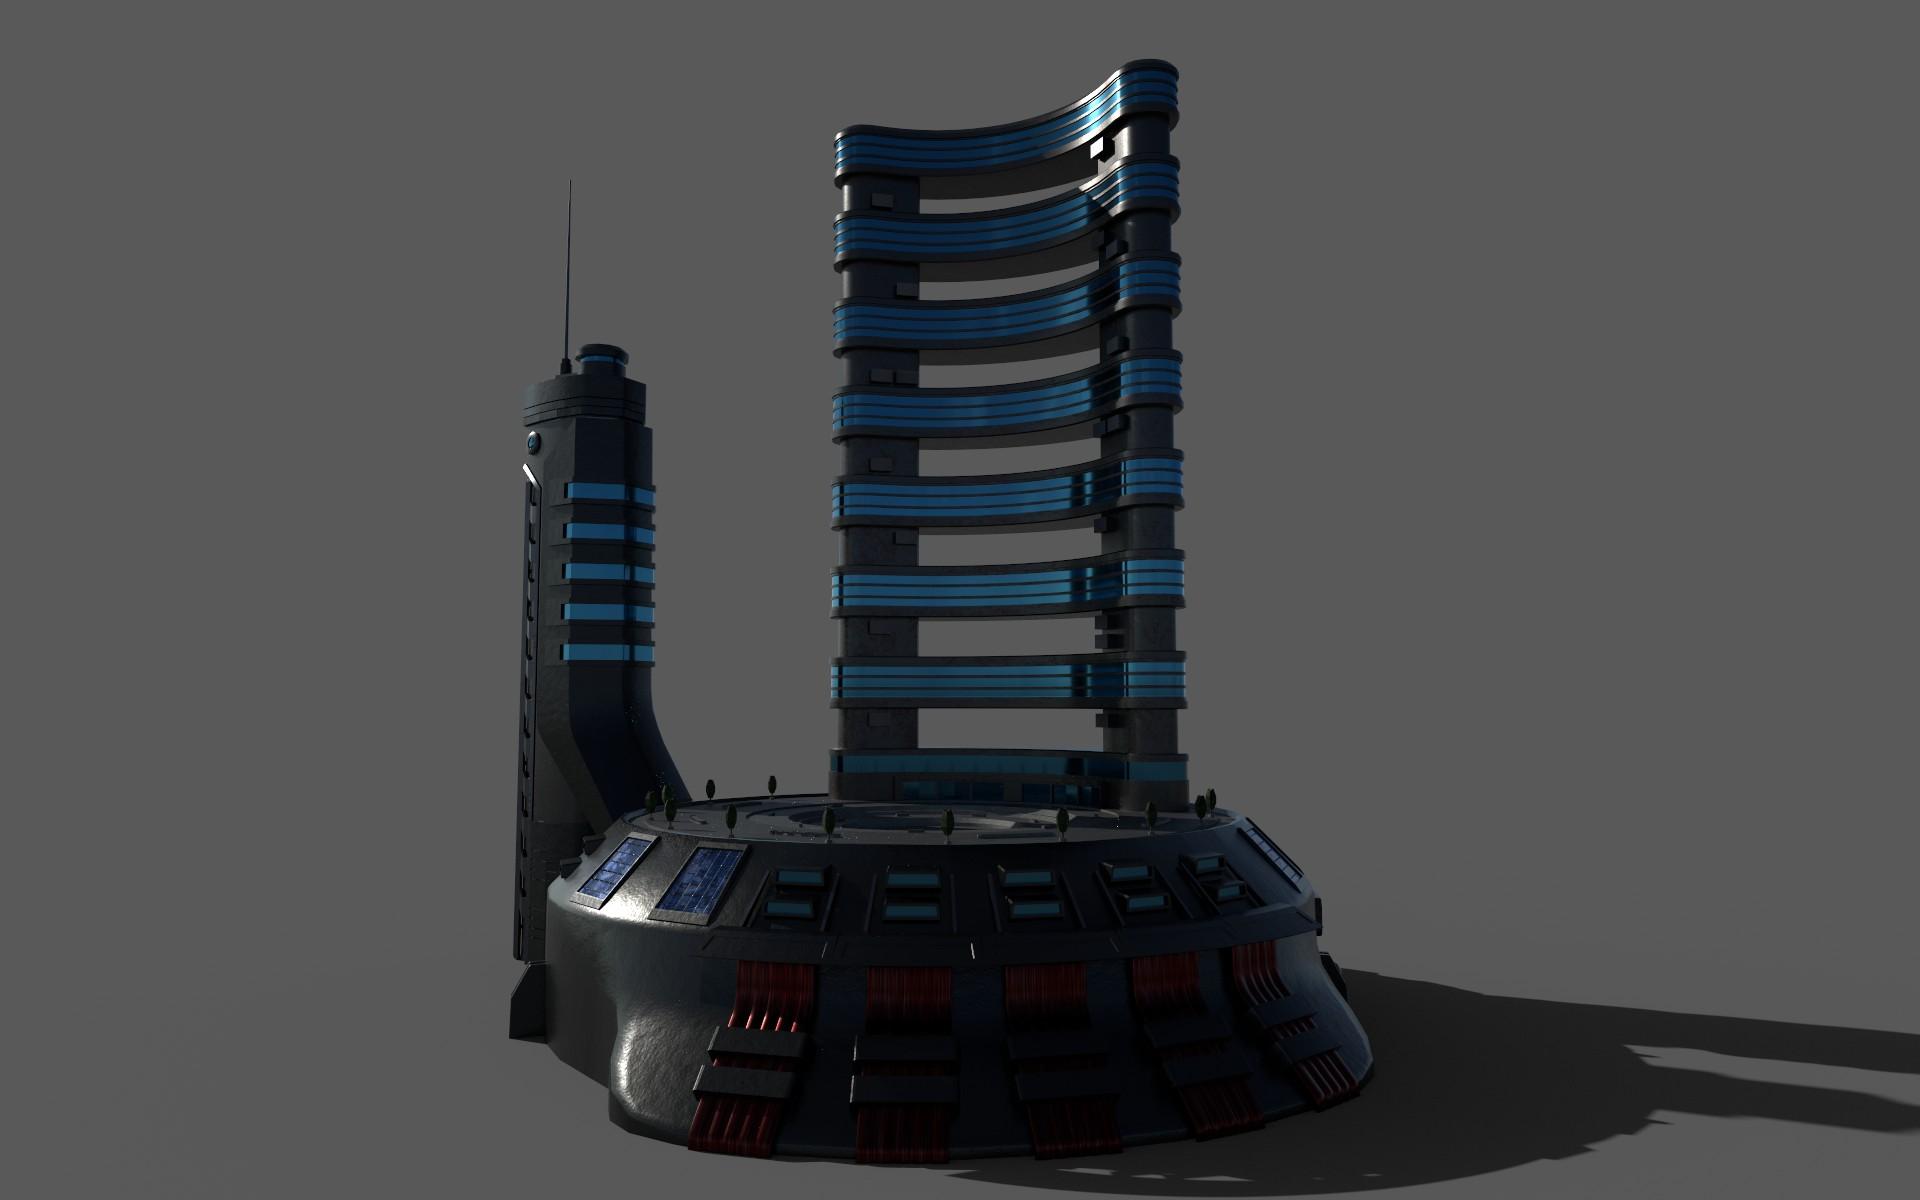 sci-fi hotel 3d model 3ds max fbx dae obj 272850